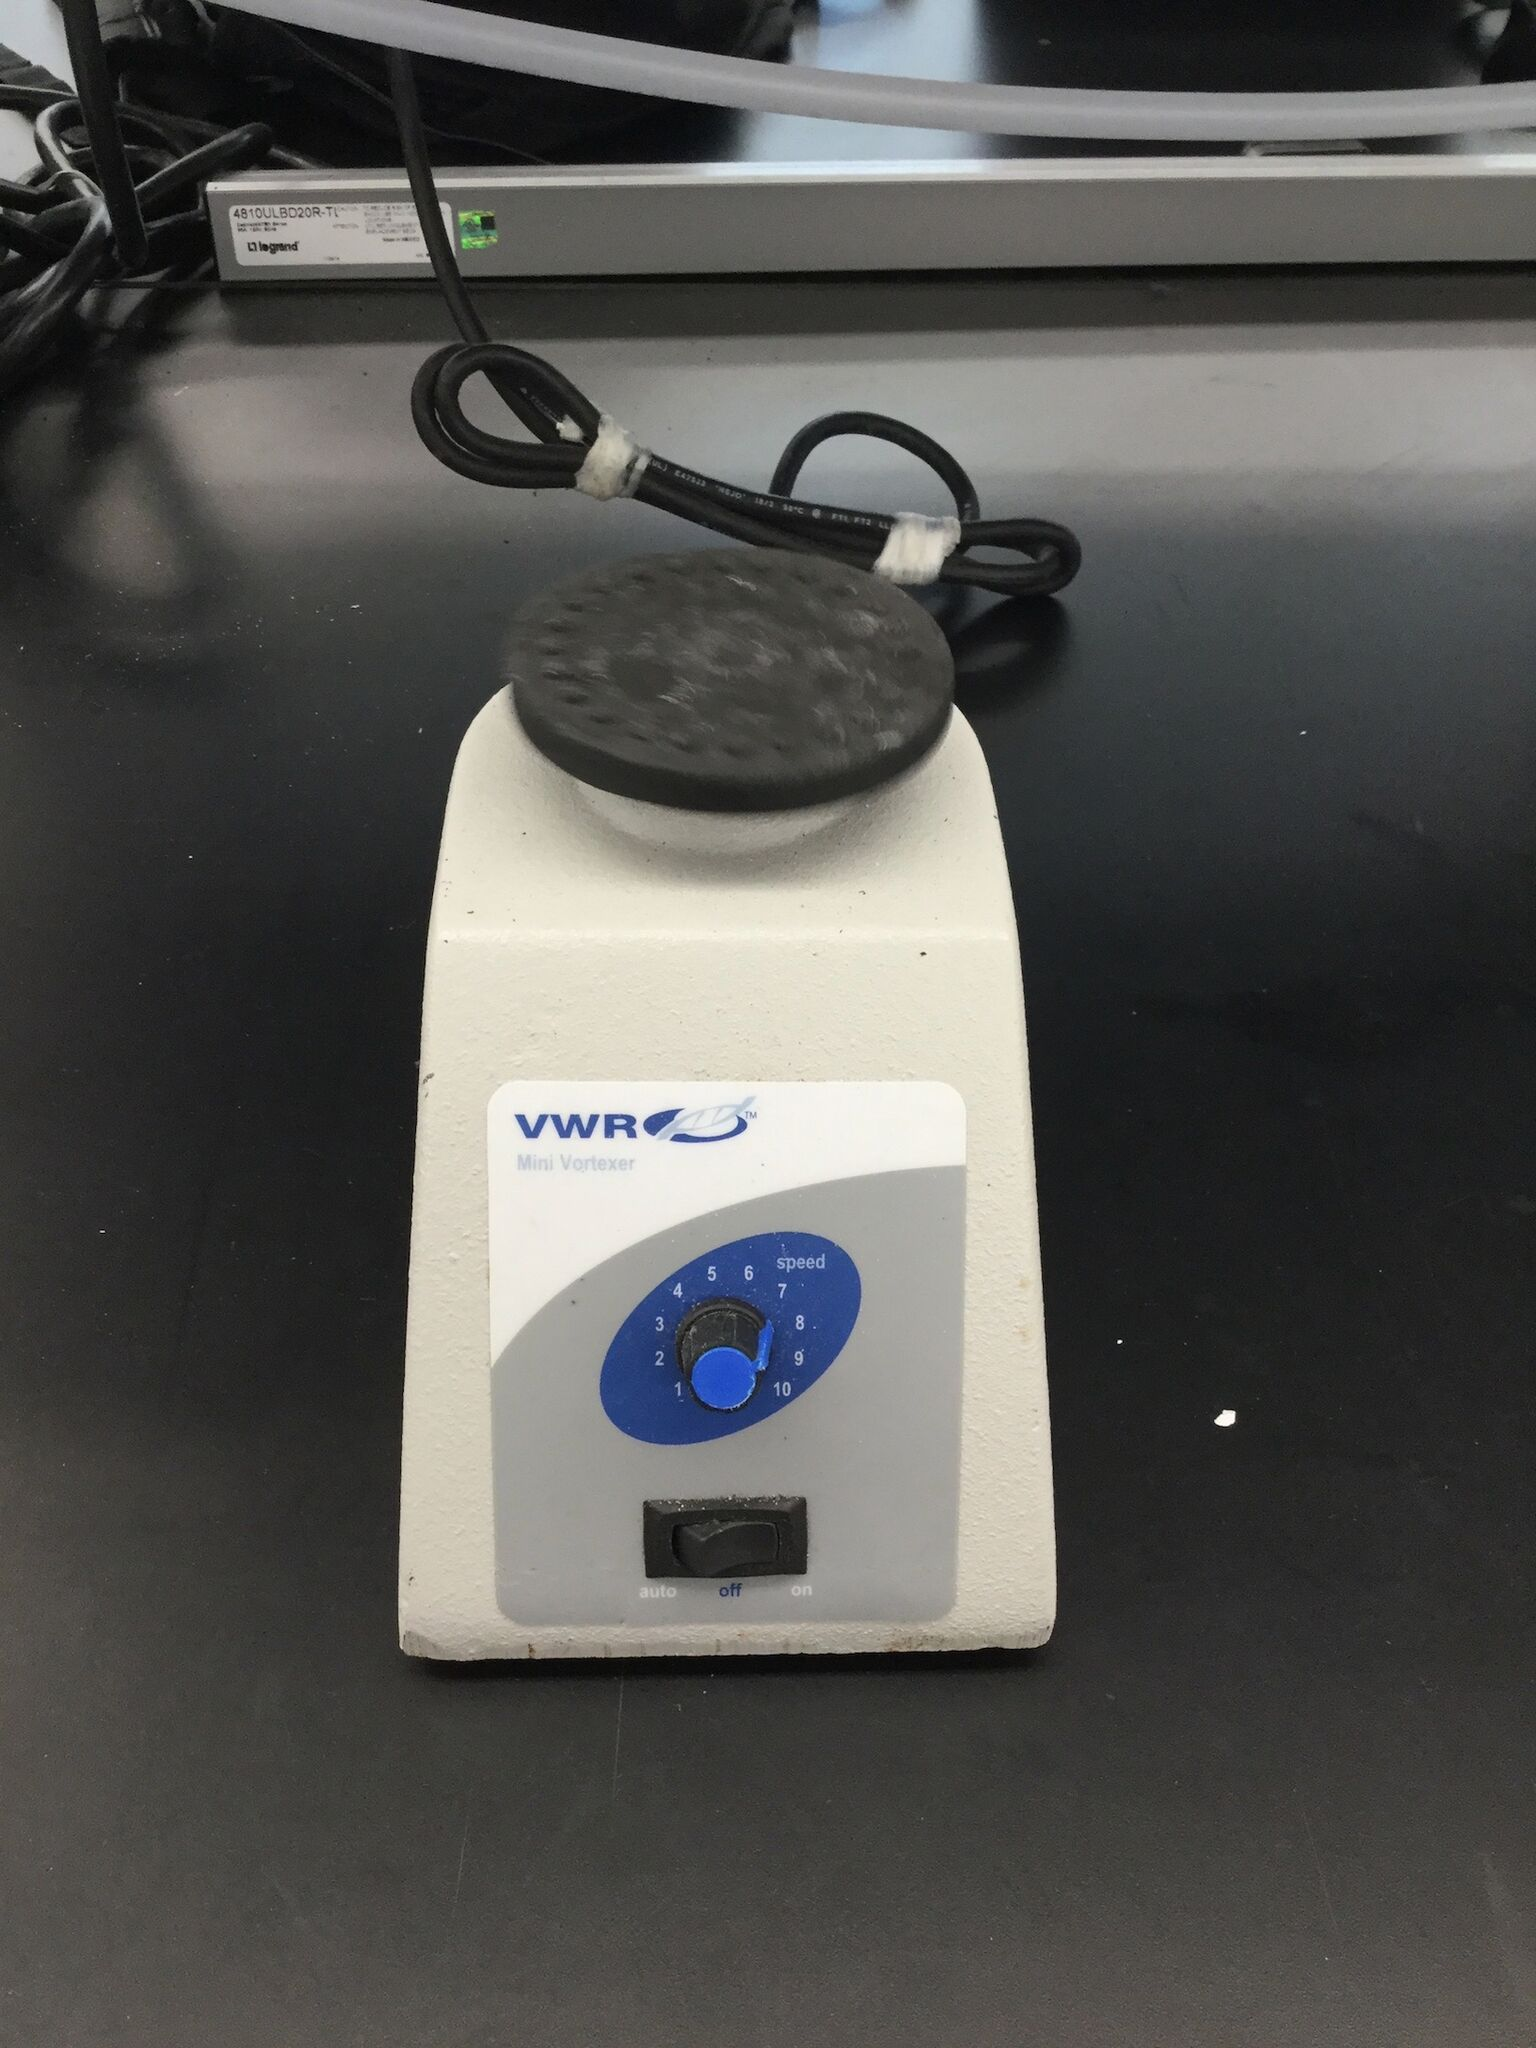 Lot 54 - VWR VM-3000 Mini Vortexer